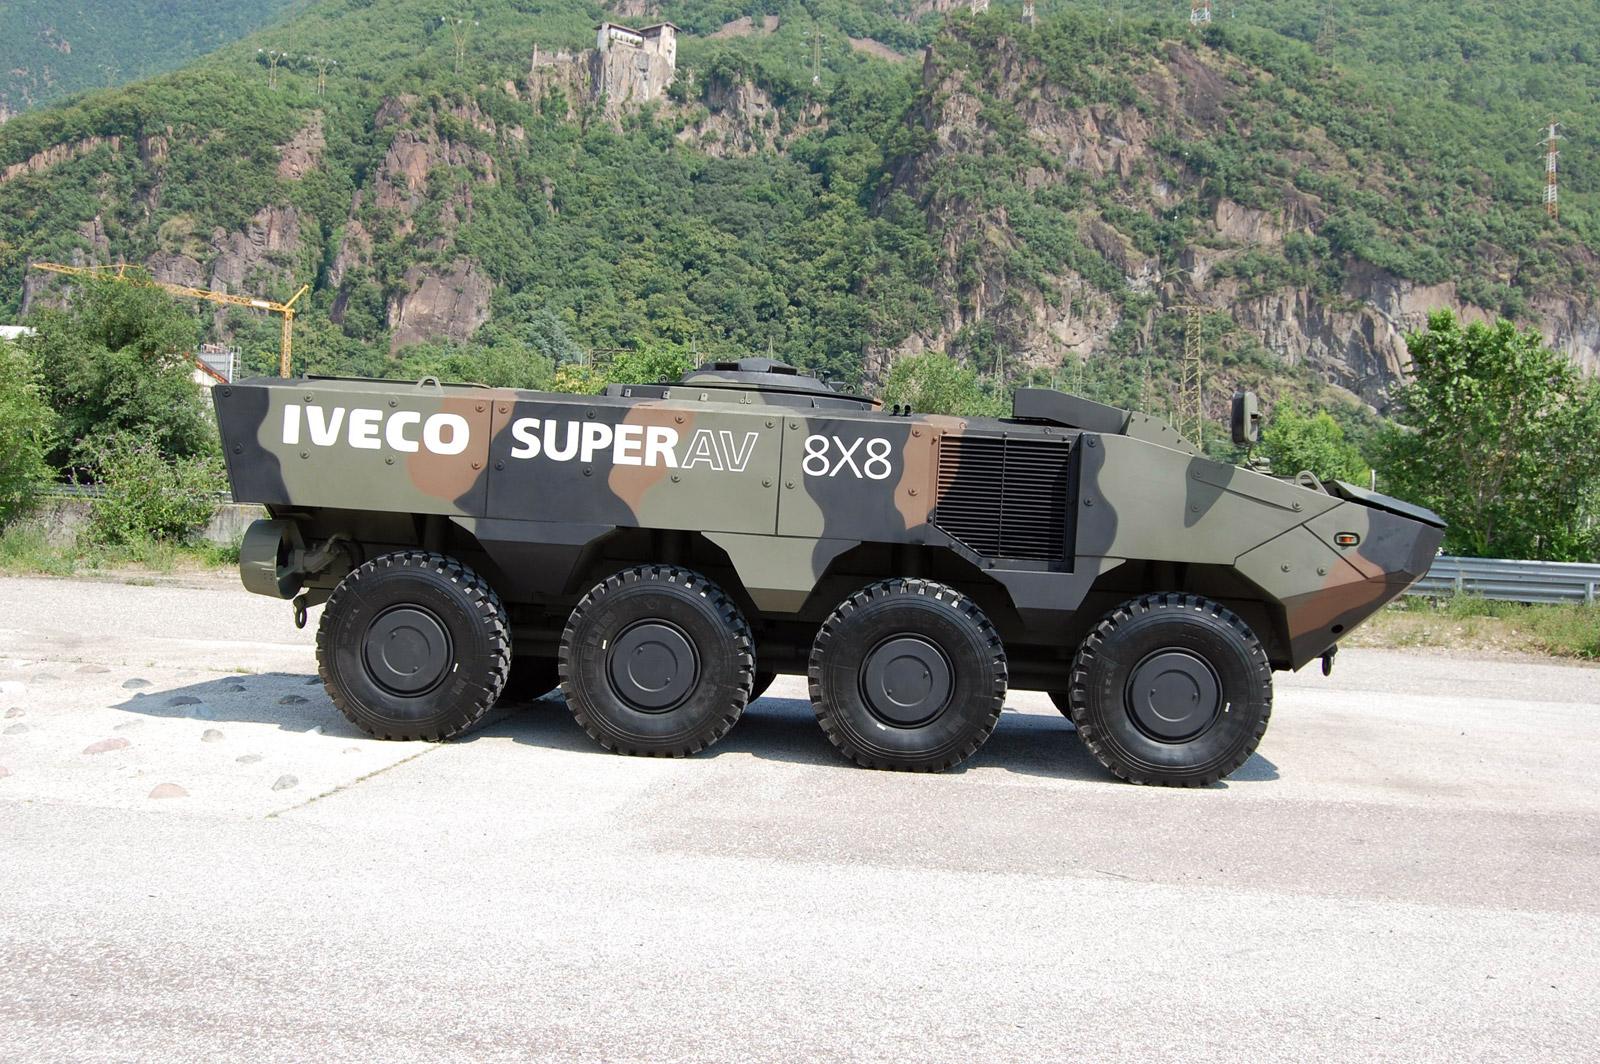 Armée Italienne/Forze Armate Italiane - Page 6 Superav2